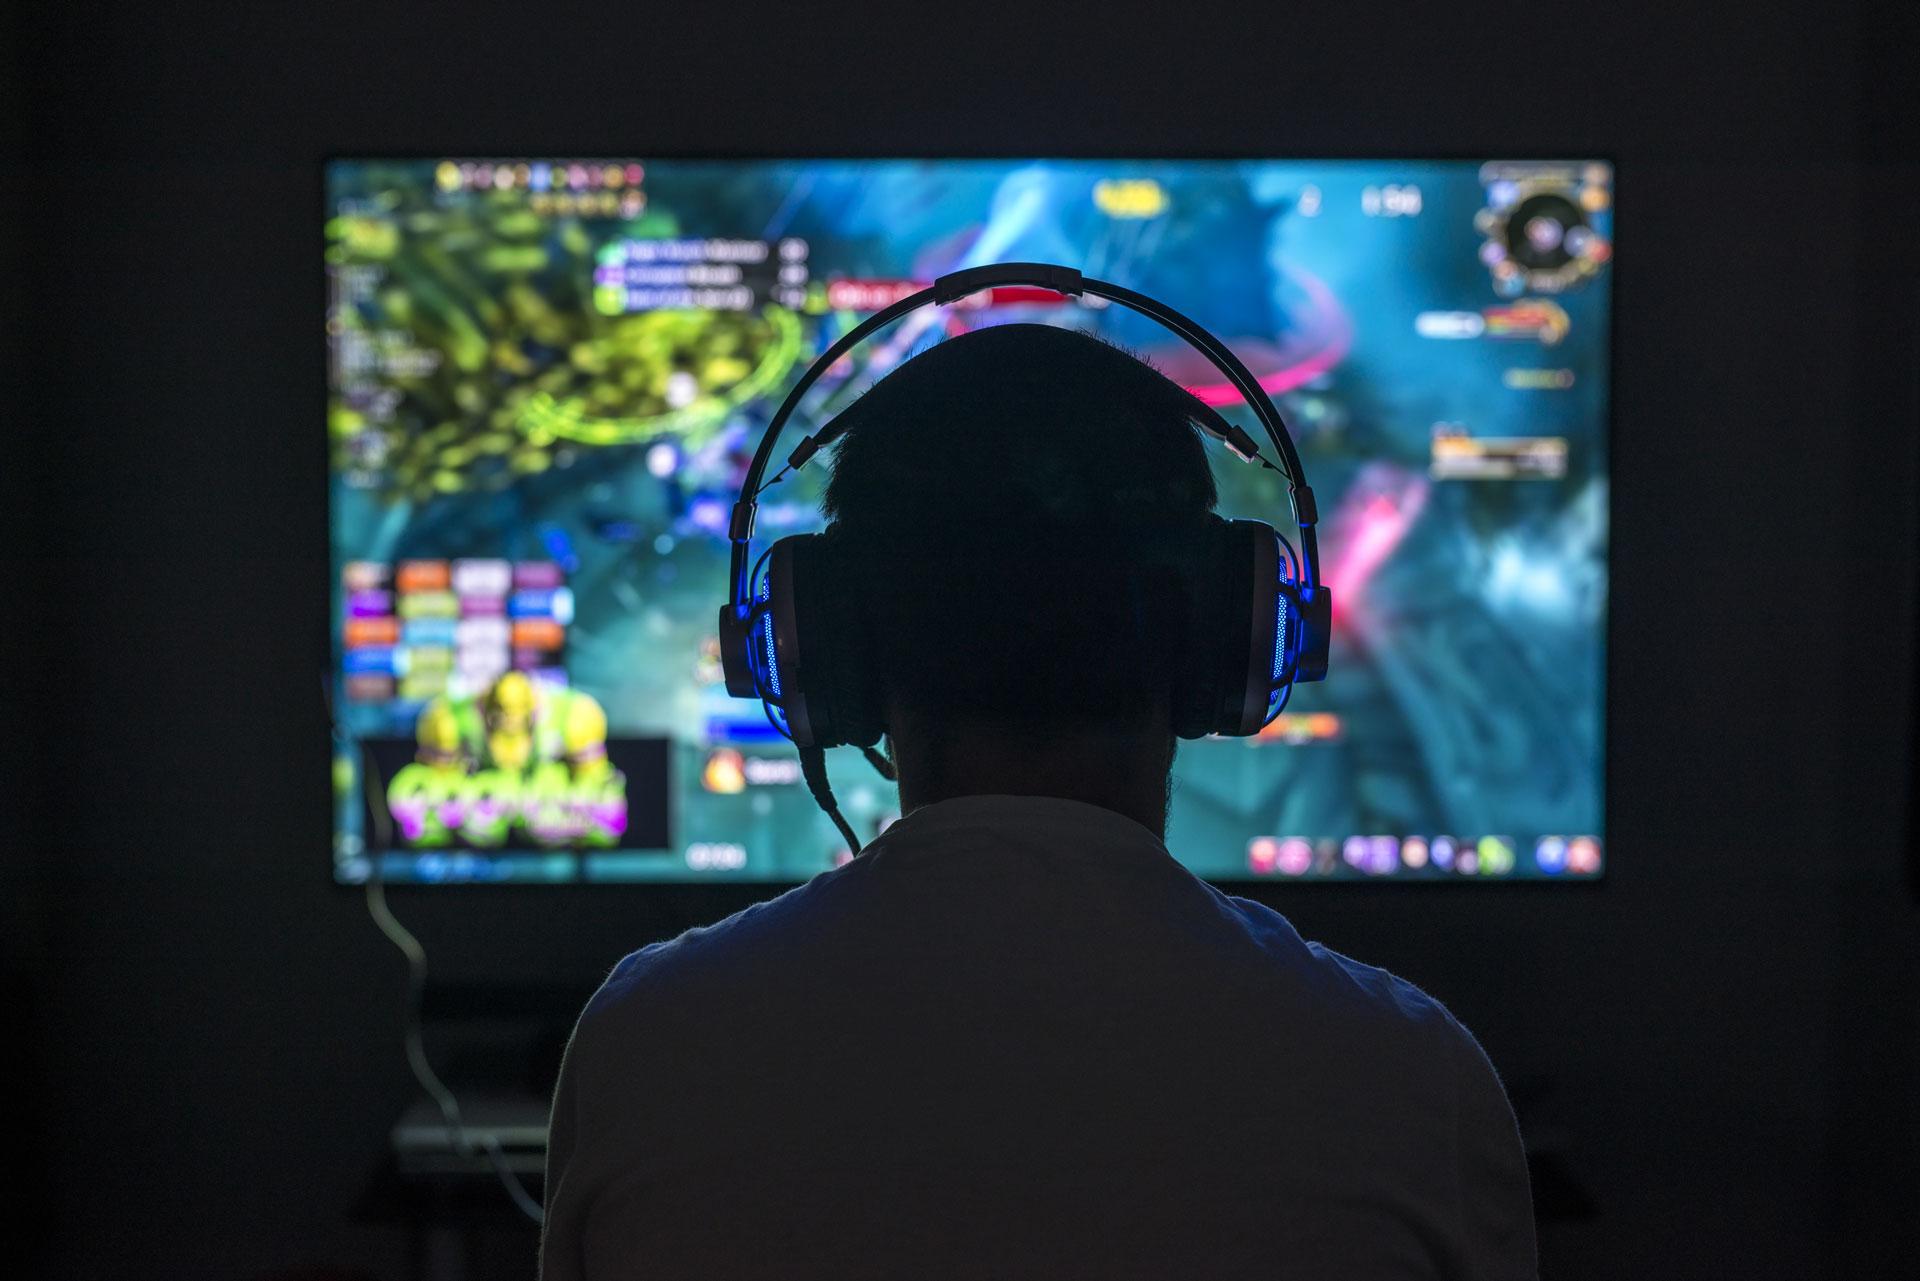 computer-gamer-looking-at-tv.jpg